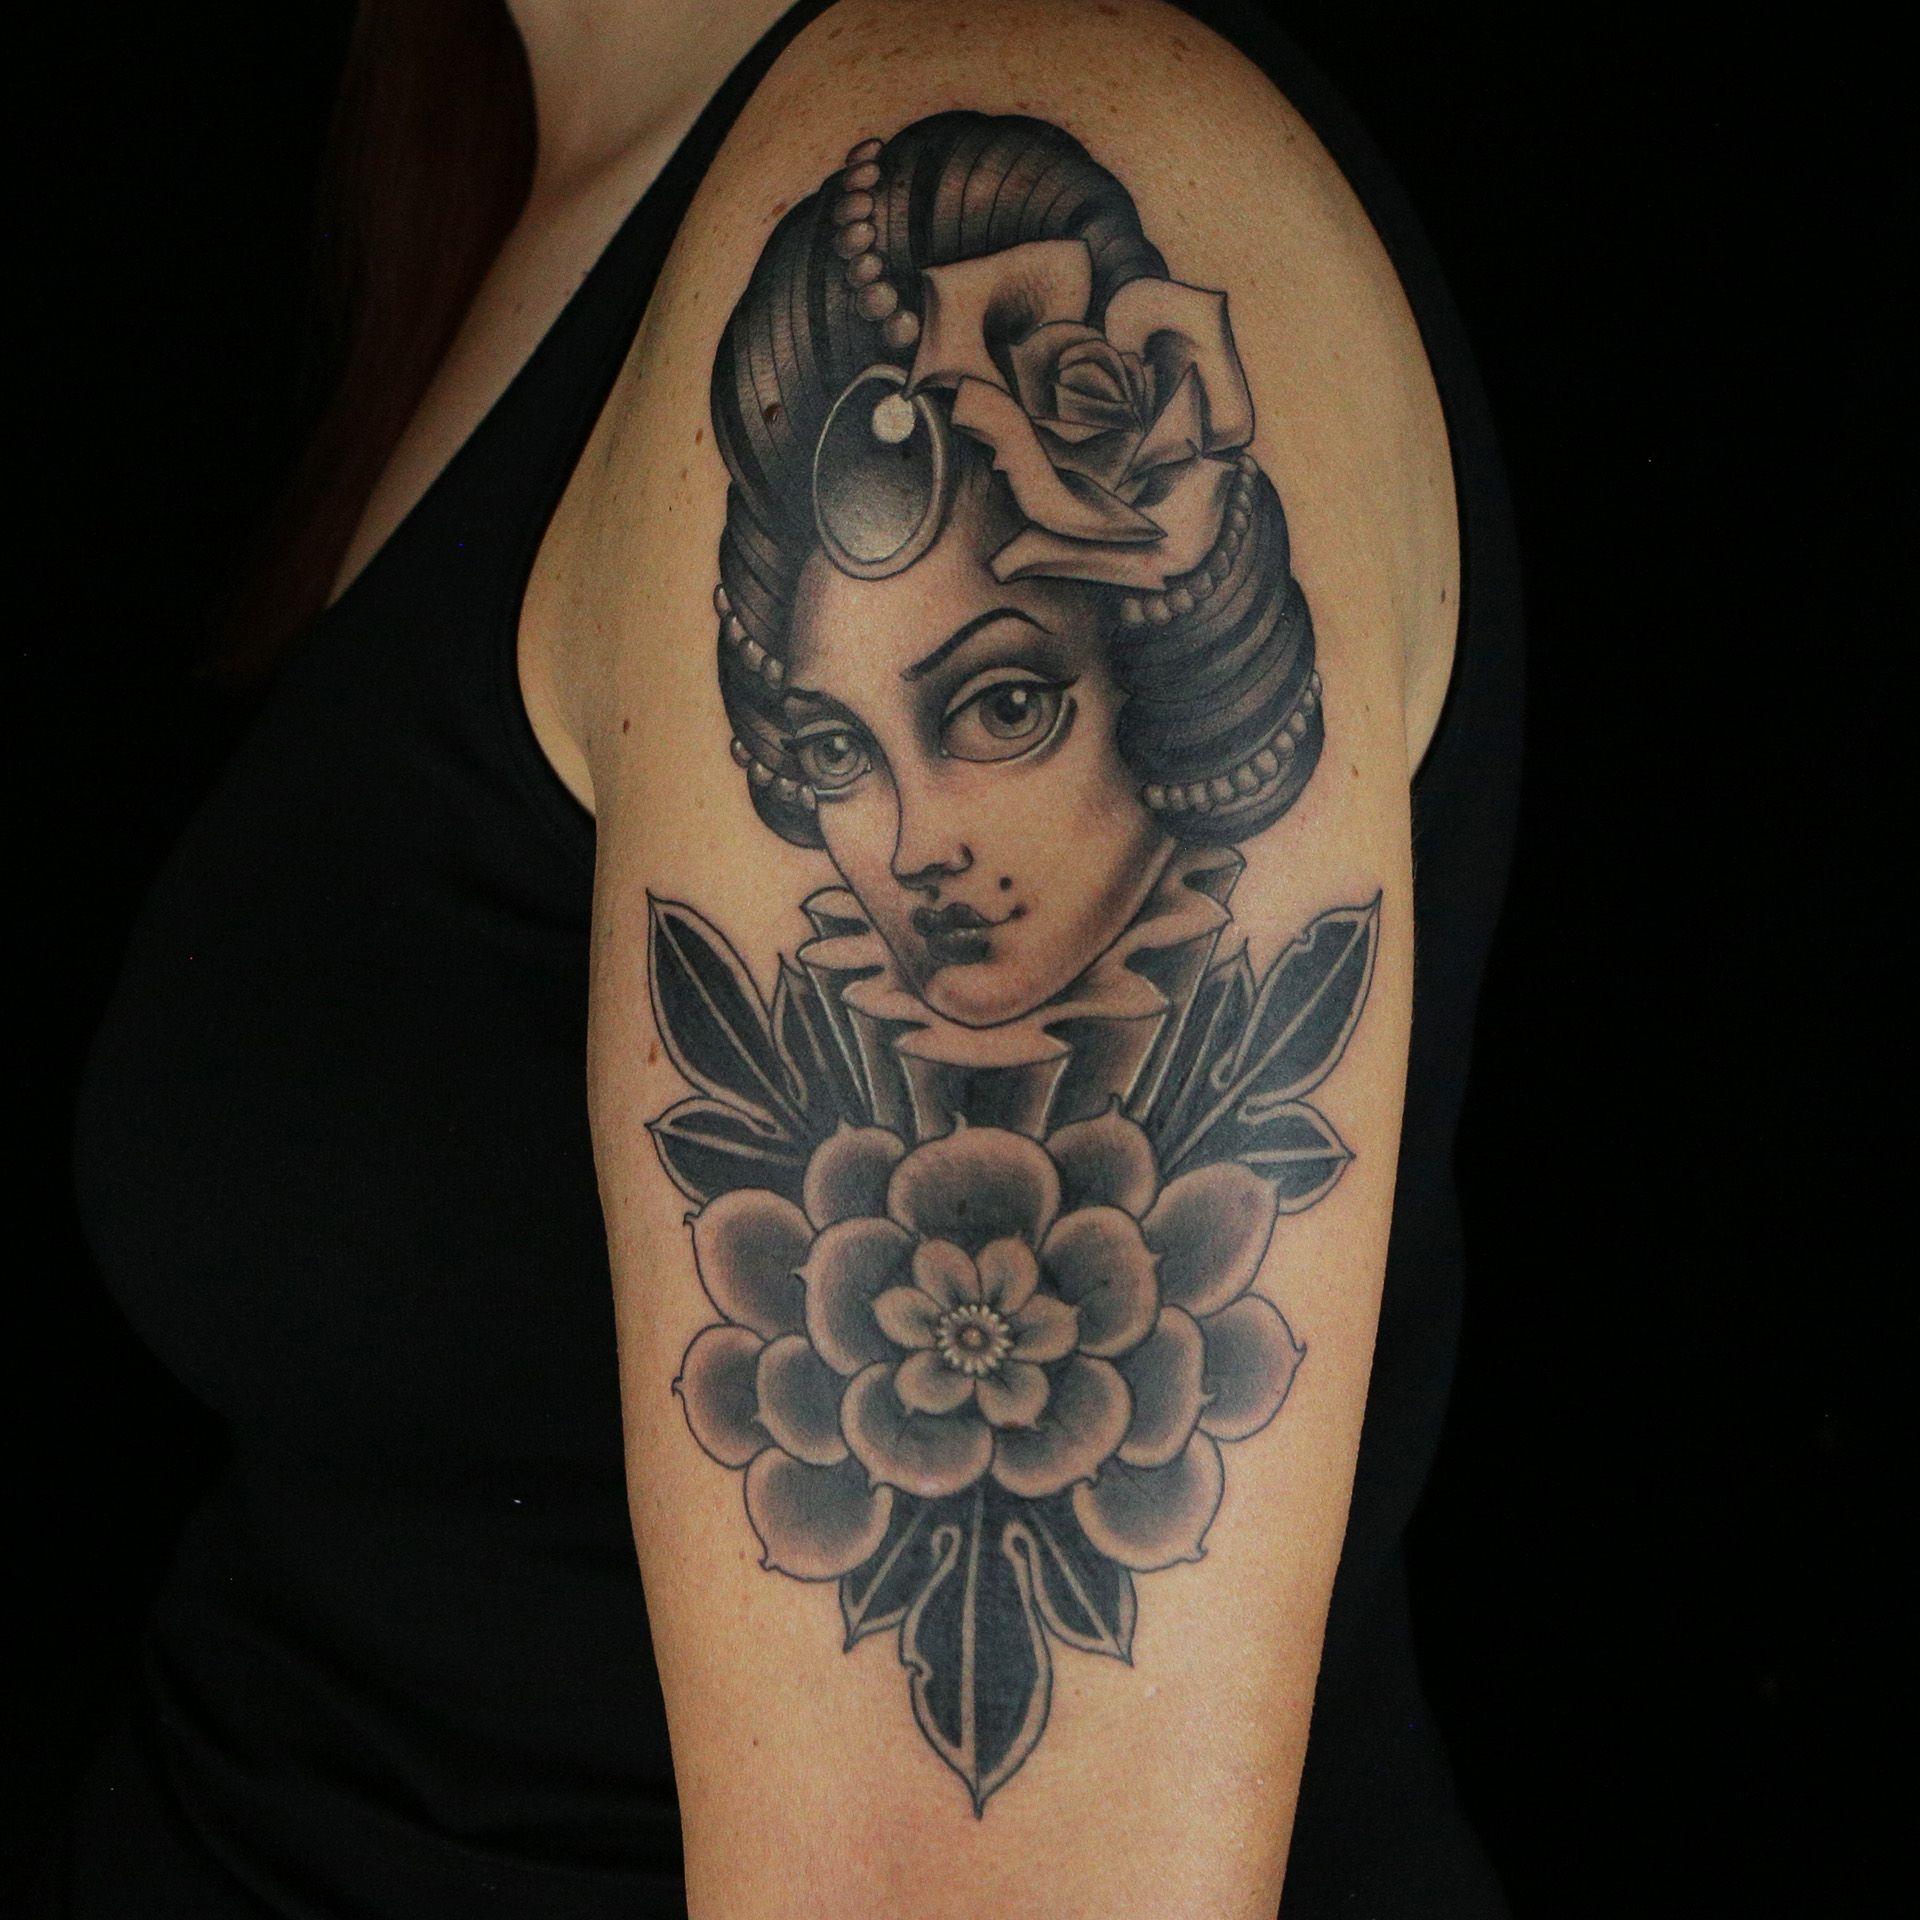 Tattoo by Tim Furlow Artists' Choice Tattoos (Ink Master